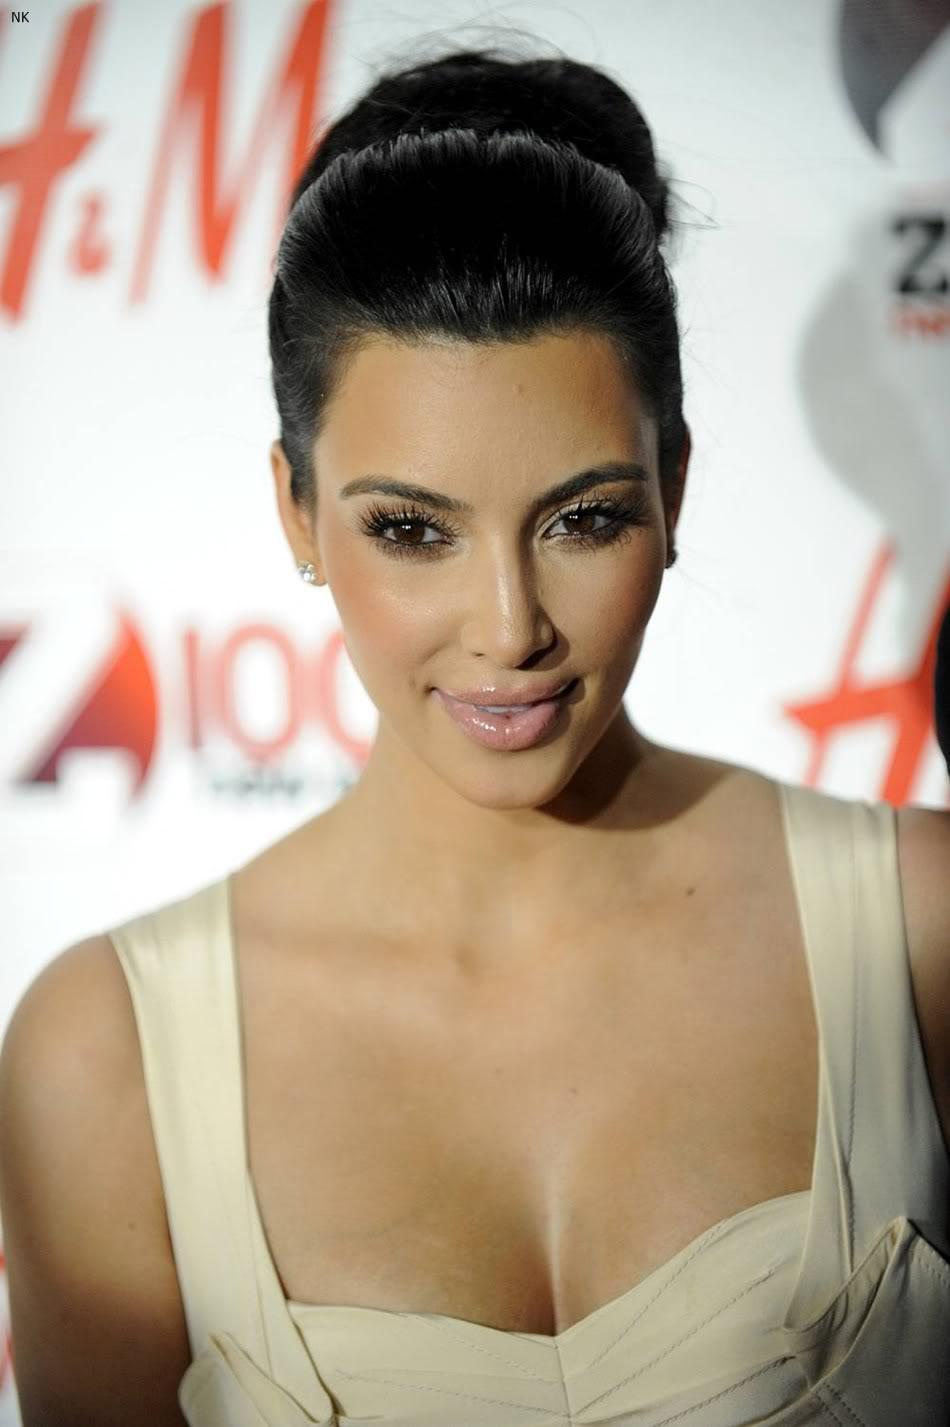 http://2.bp.blogspot.com/-3thnAe8THHM/TbS46rw9faI/AAAAAAAADu0/Xngr-CHsVKg/s1600/kim_kardashian_dress%2B%252810%2529.jpg